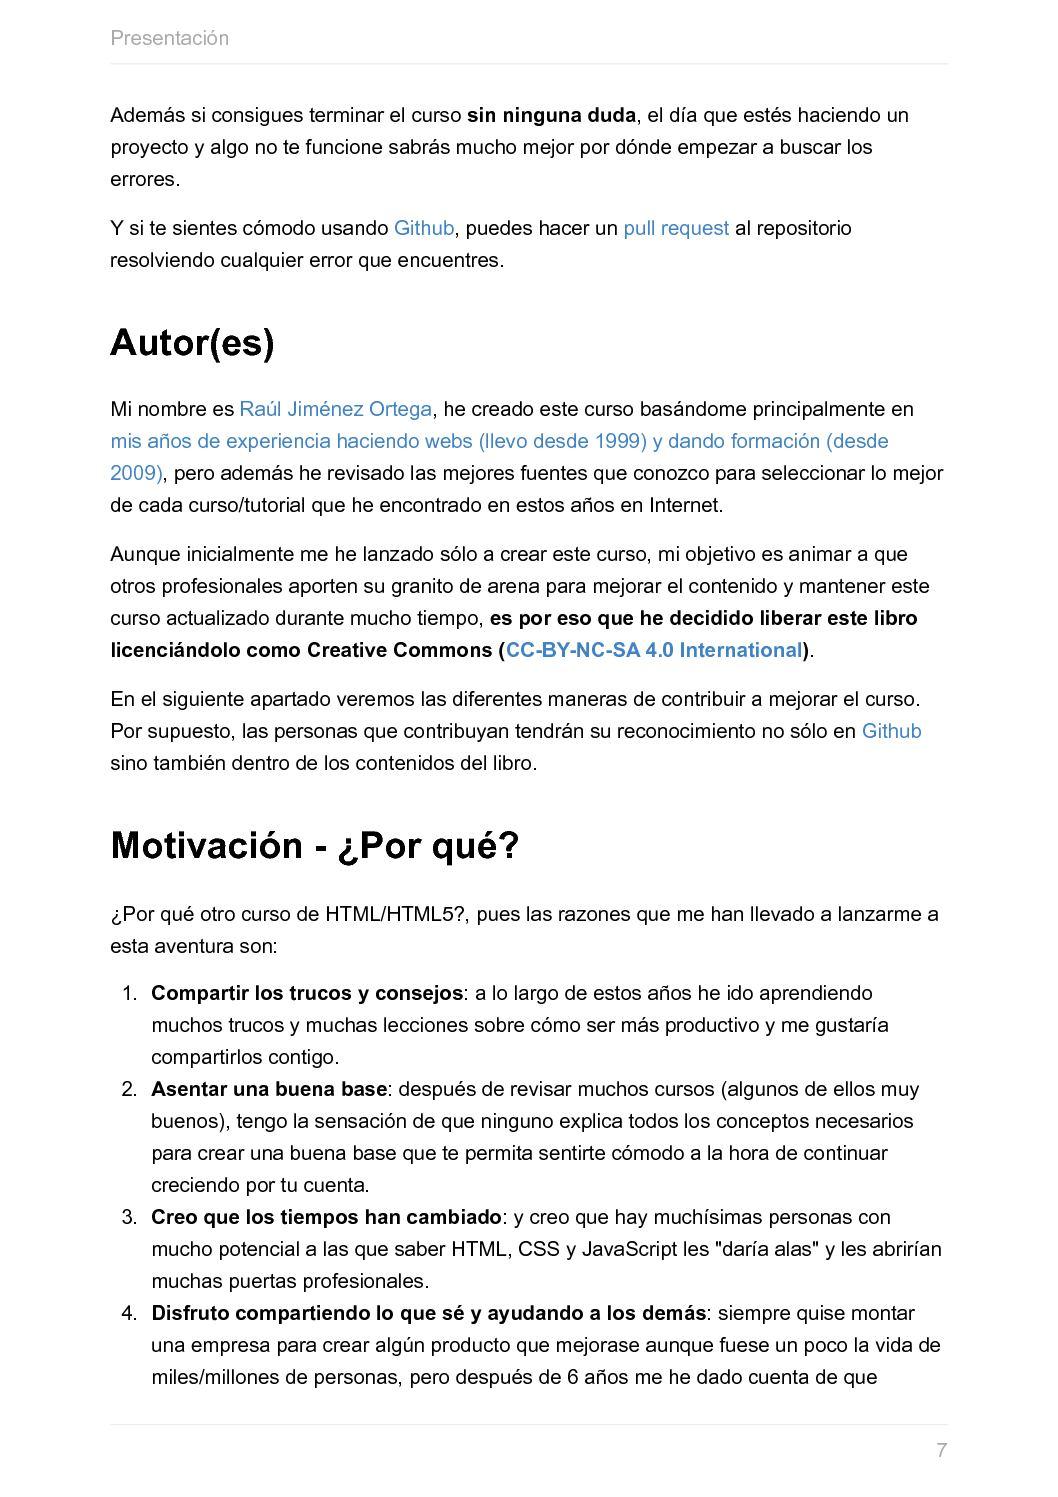 Tutorial de html - CALAMEO Downloader